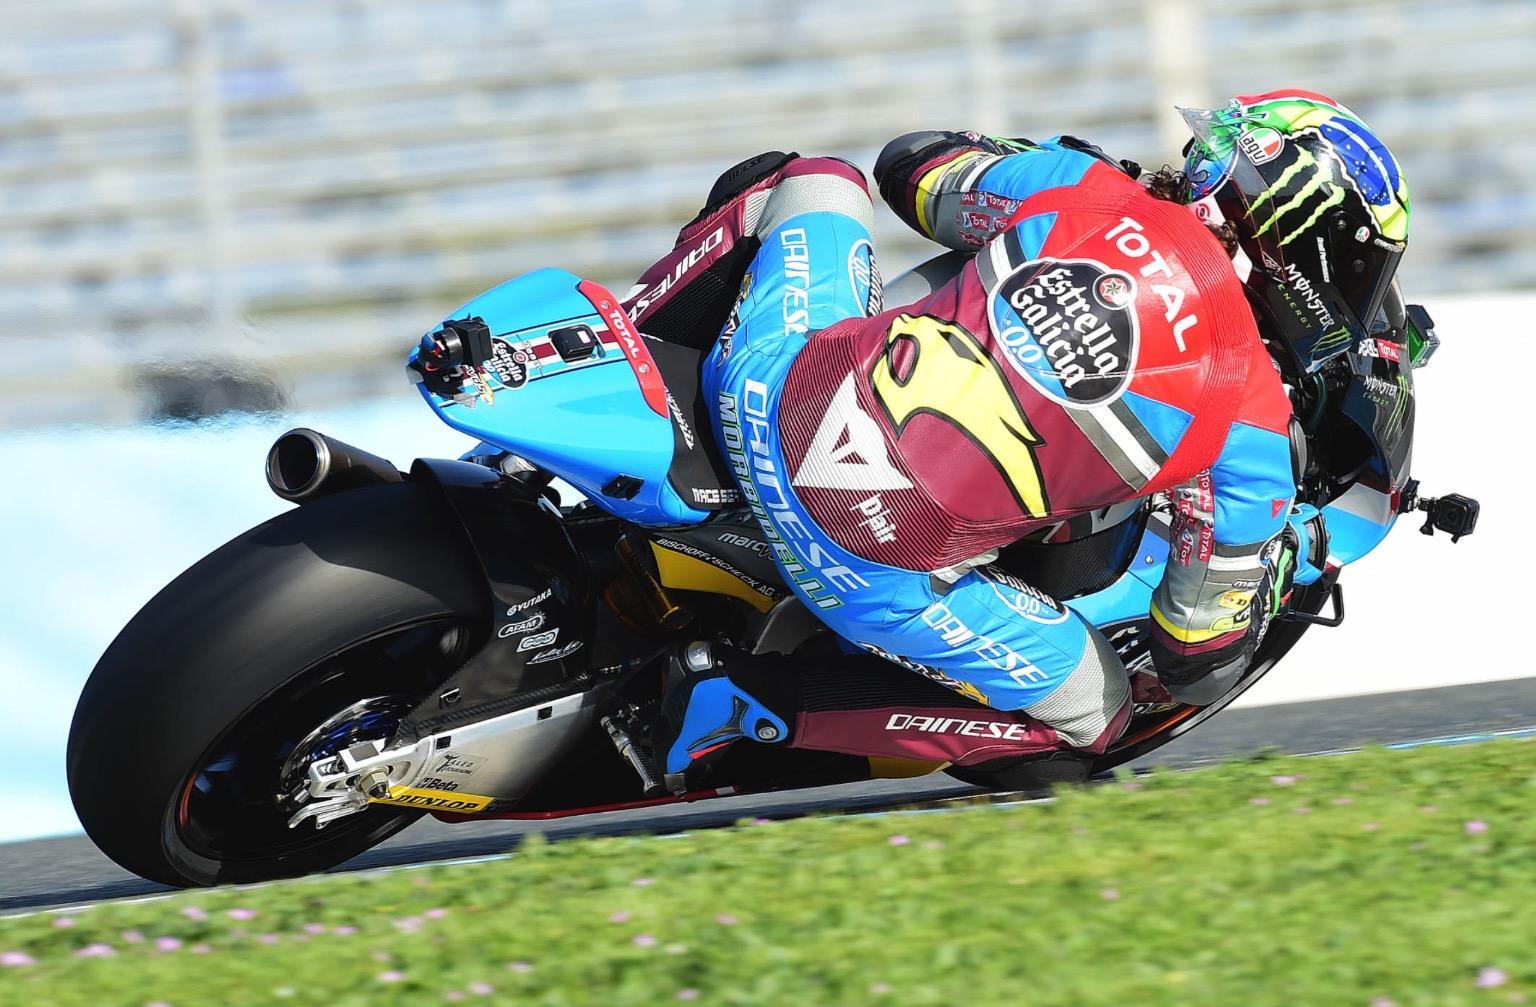 Moto2, Storica vittoria di Alex Marquez a Jerez, Bagnaia 2°